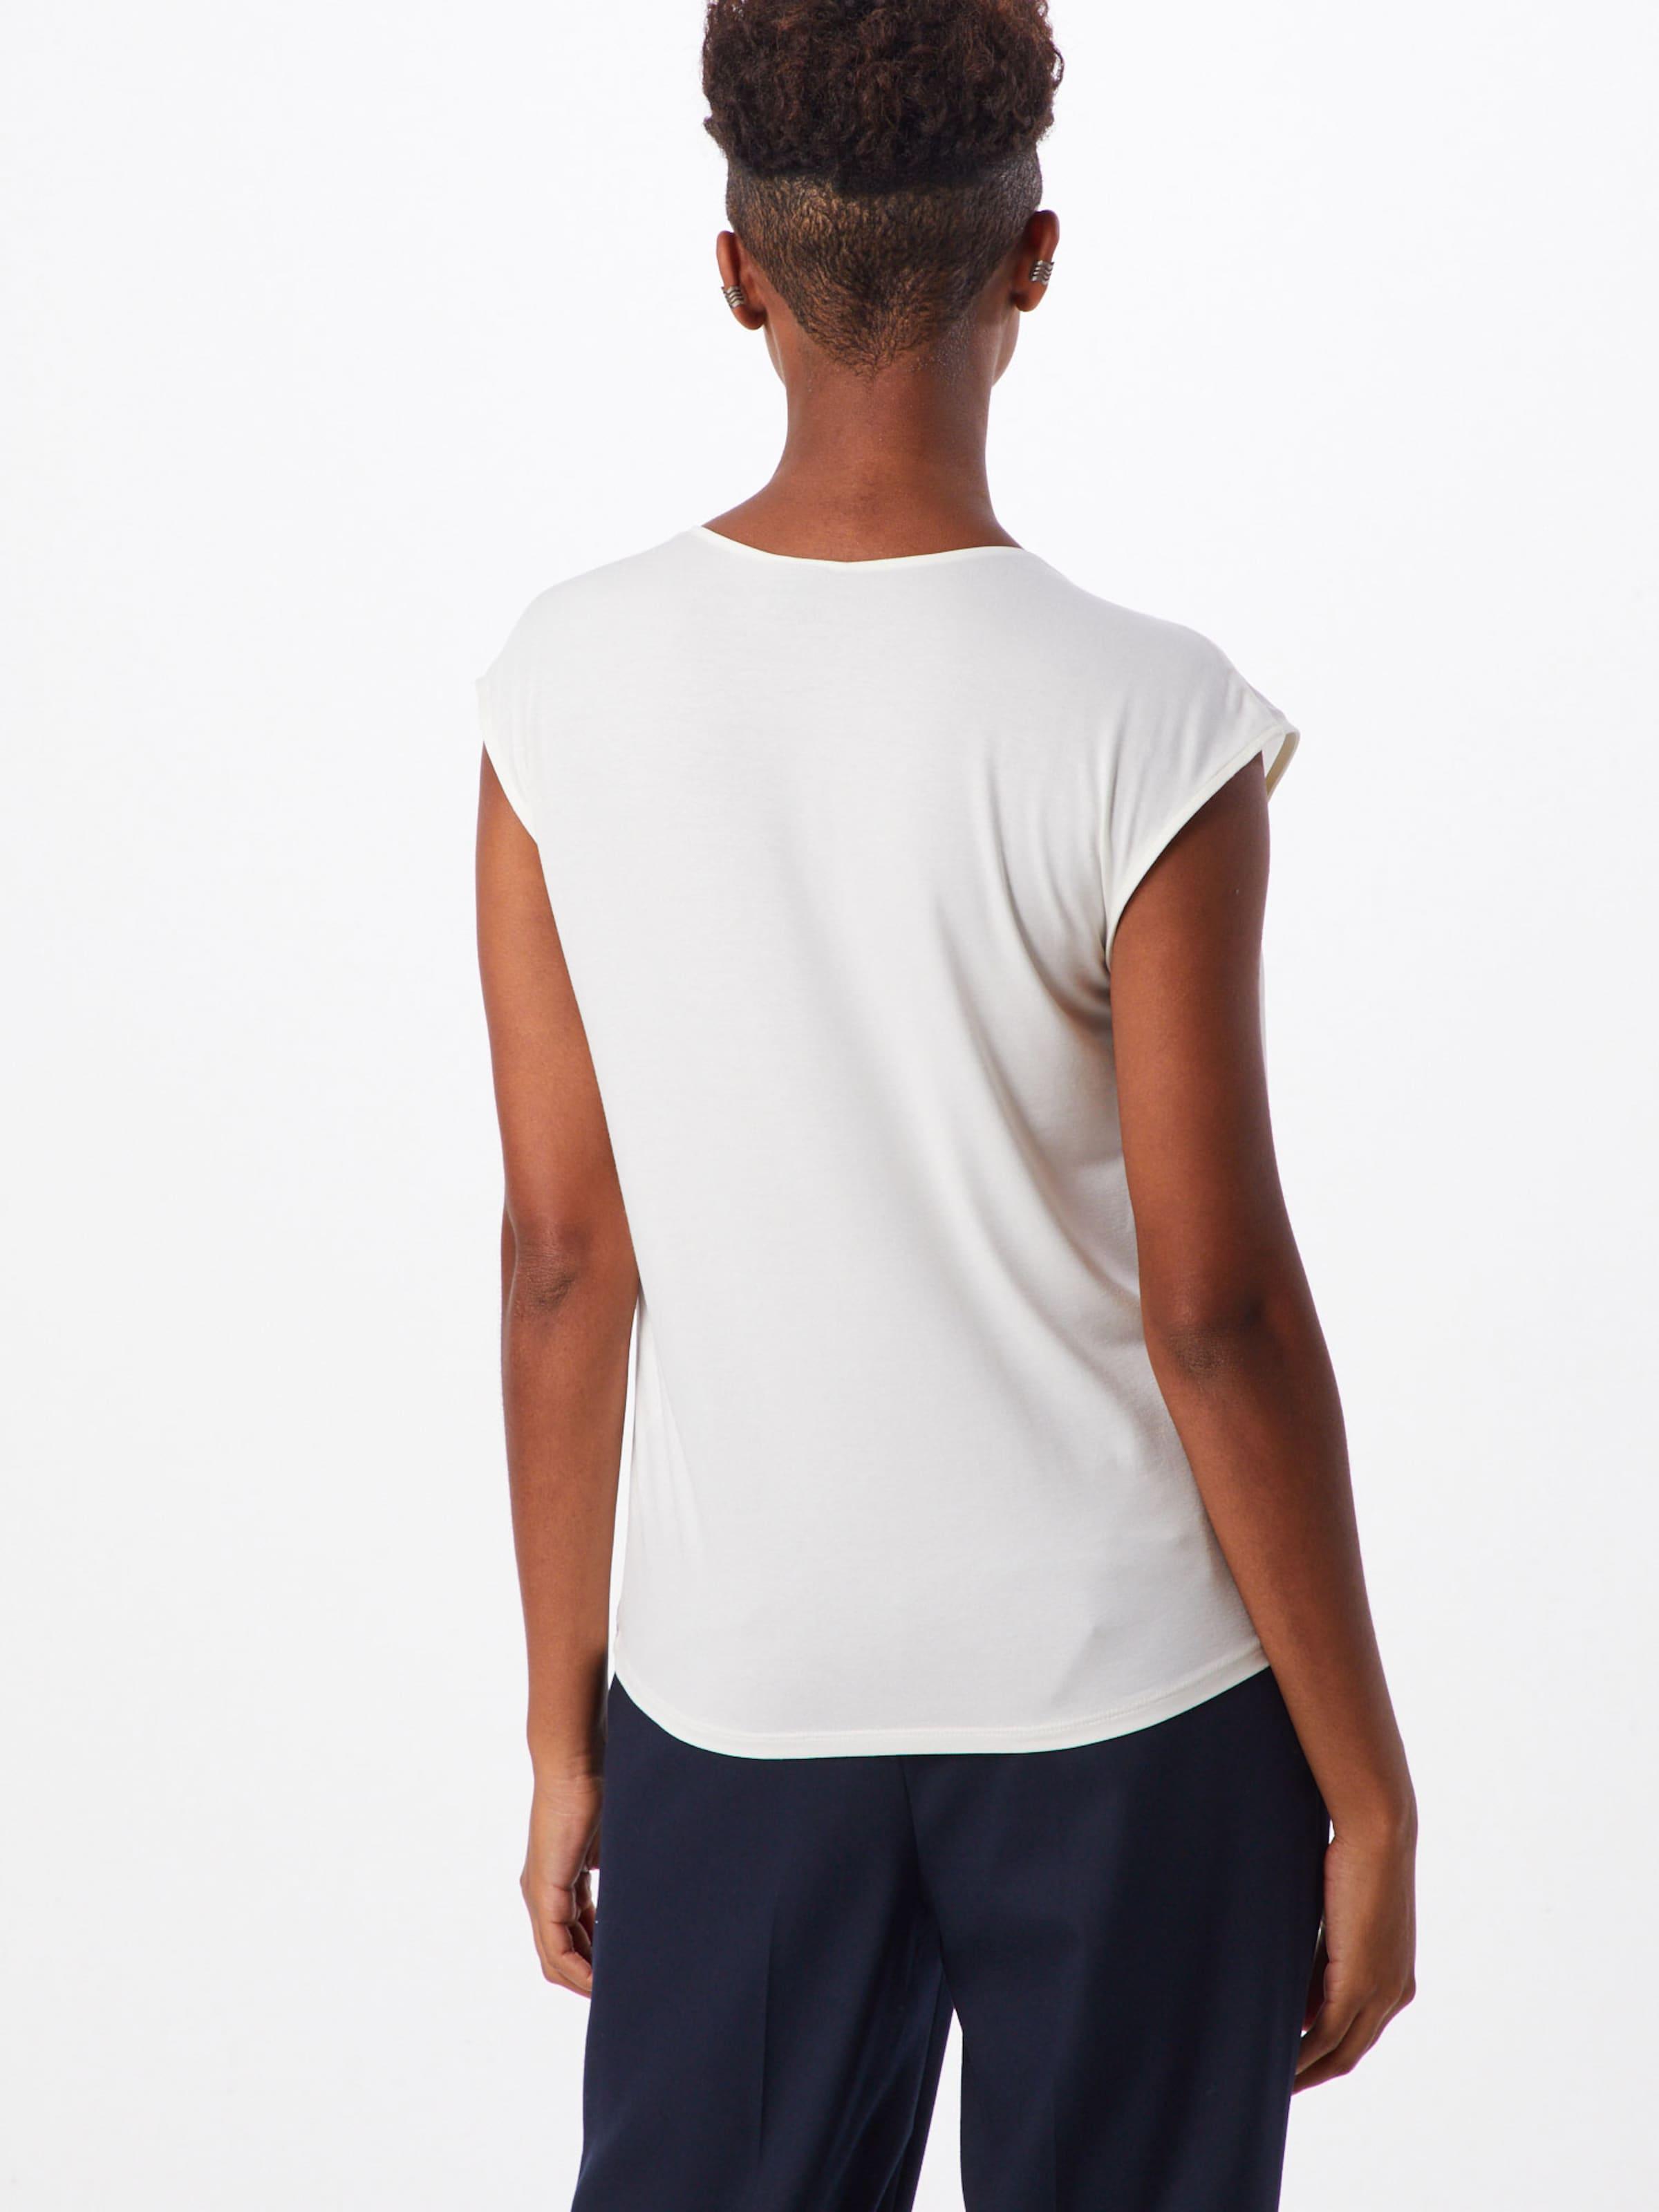 oliver Black In Label Naturweiß Shirt S j43qAL5R